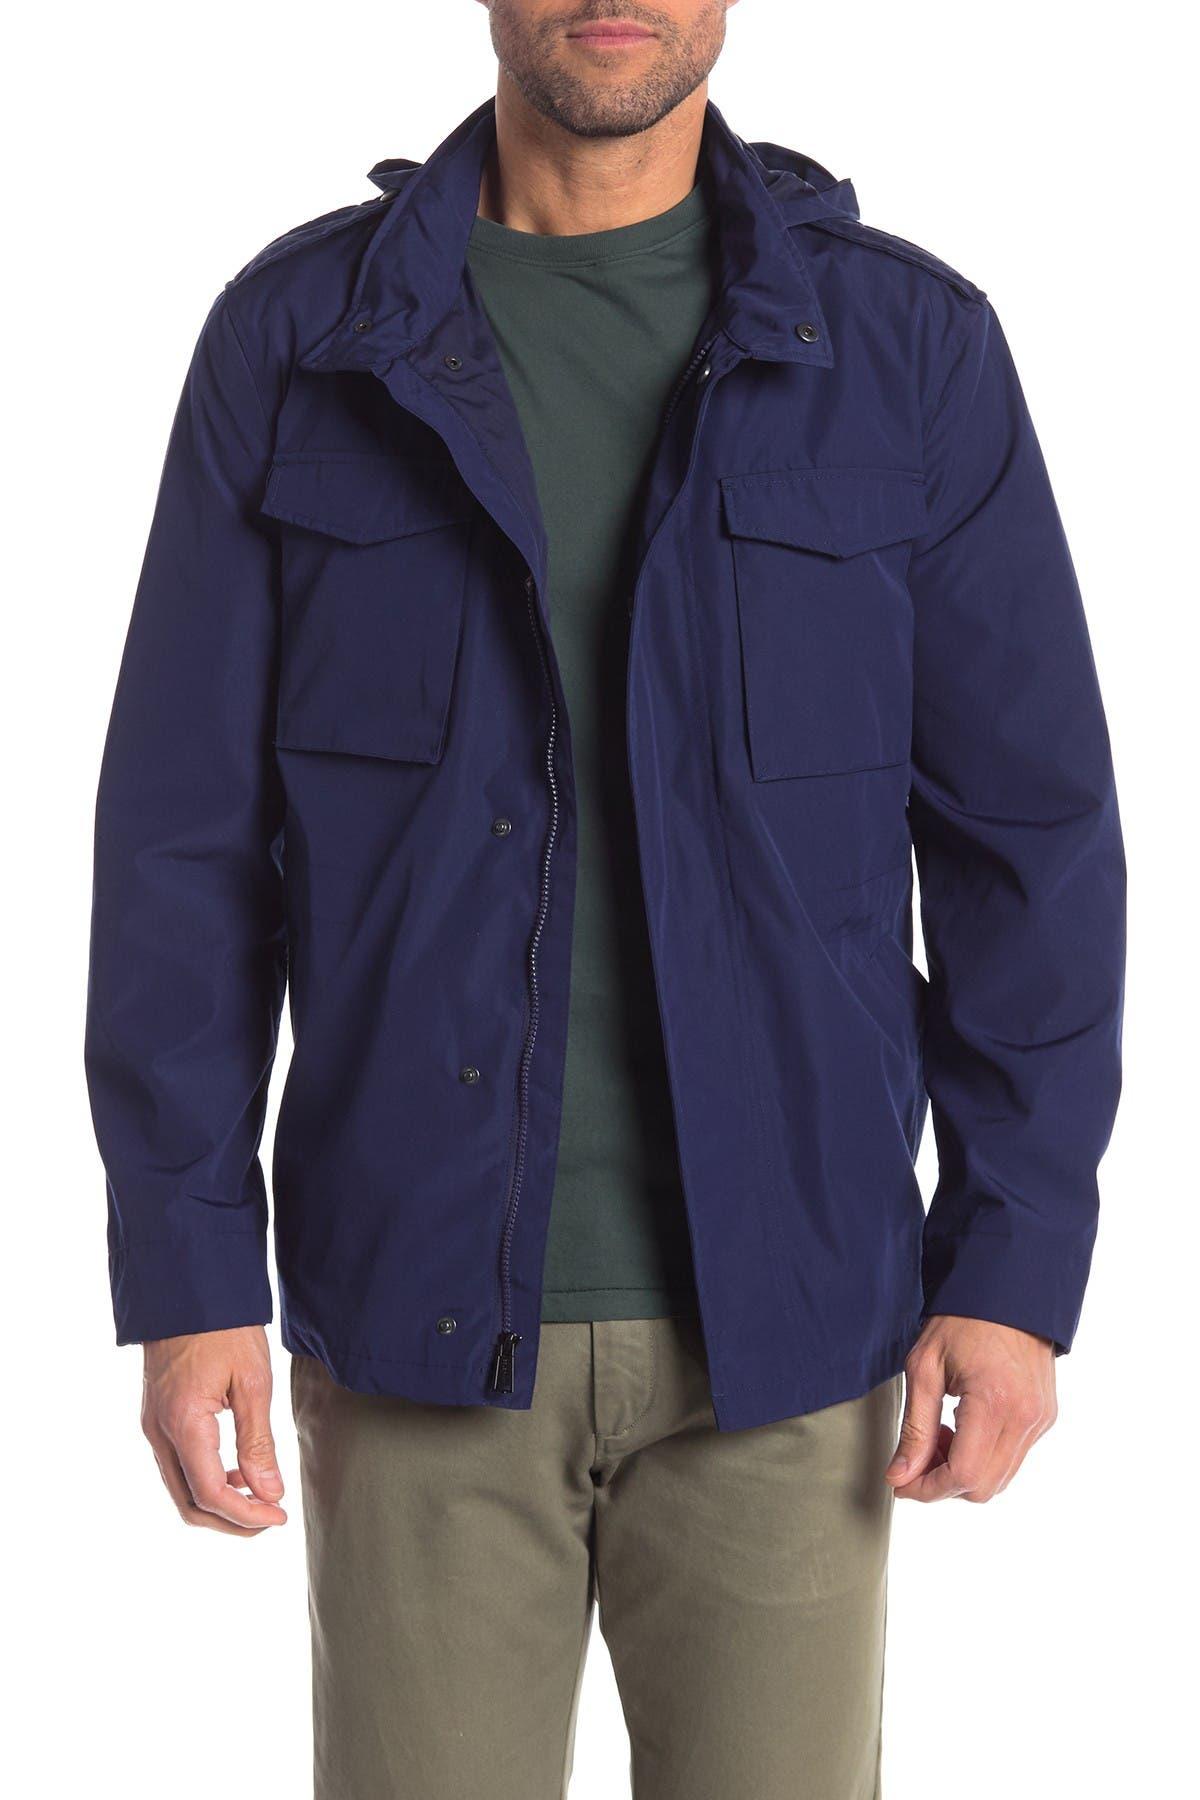 Cole Haan Mens Field Parka Jacket